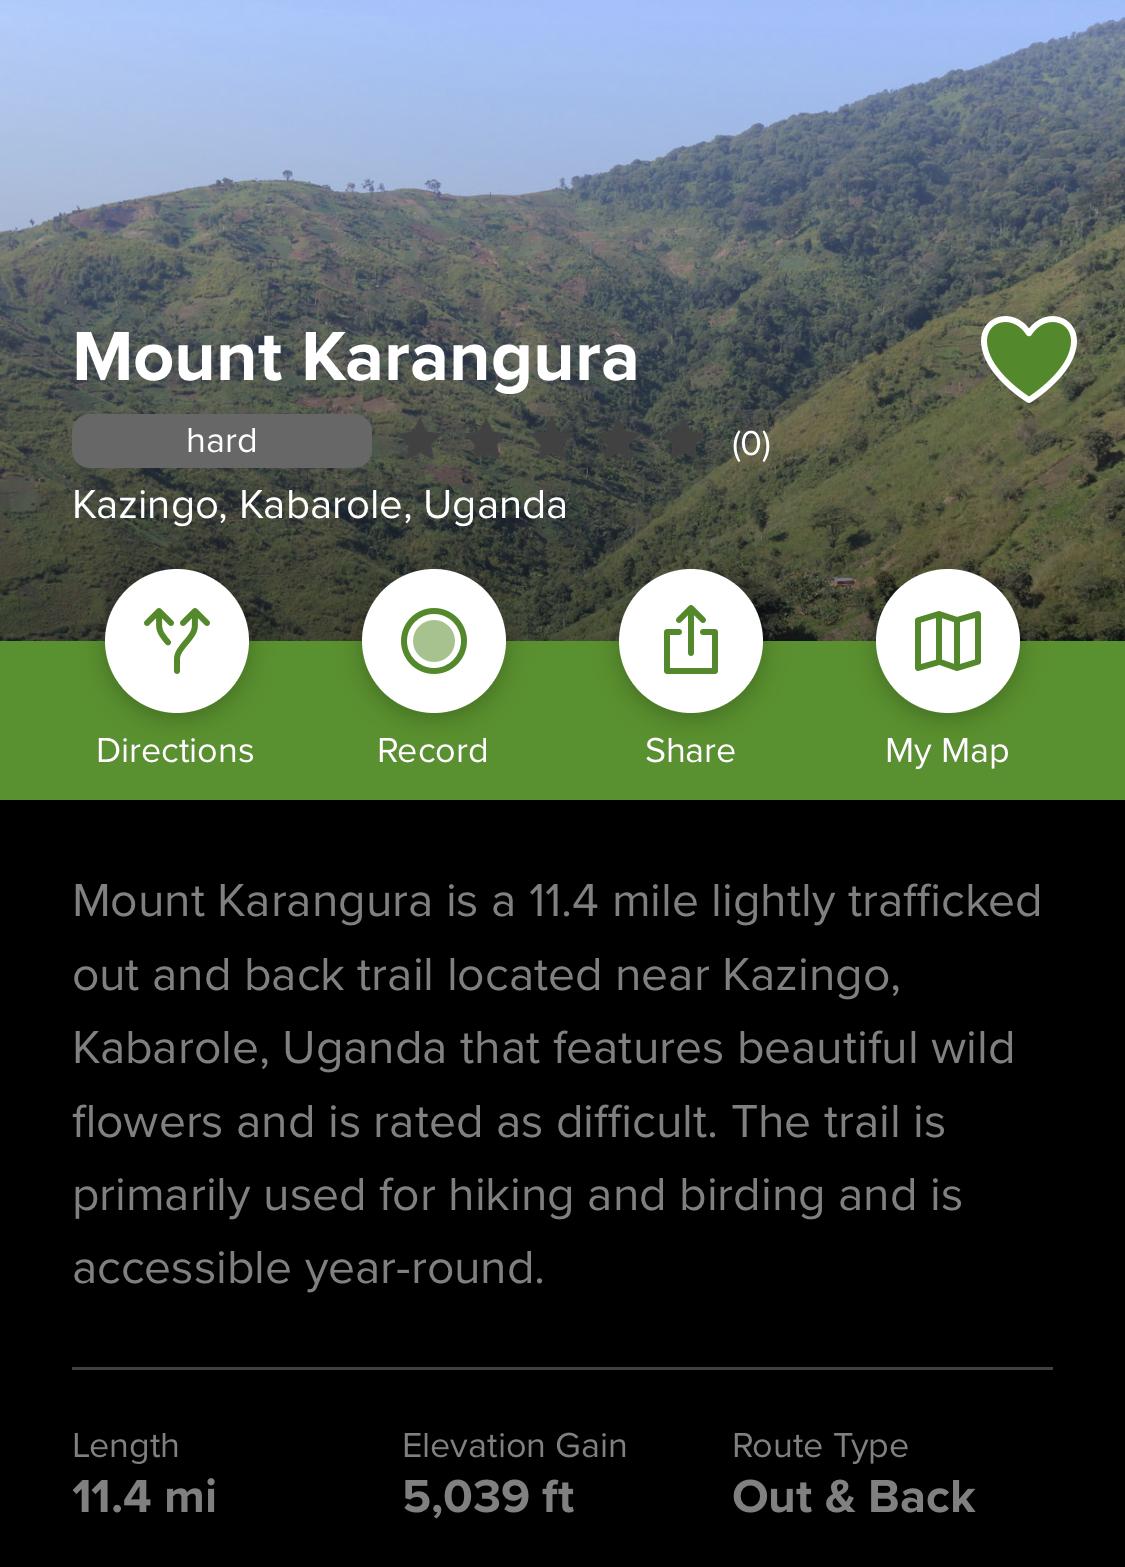 Mount Karangura Trail